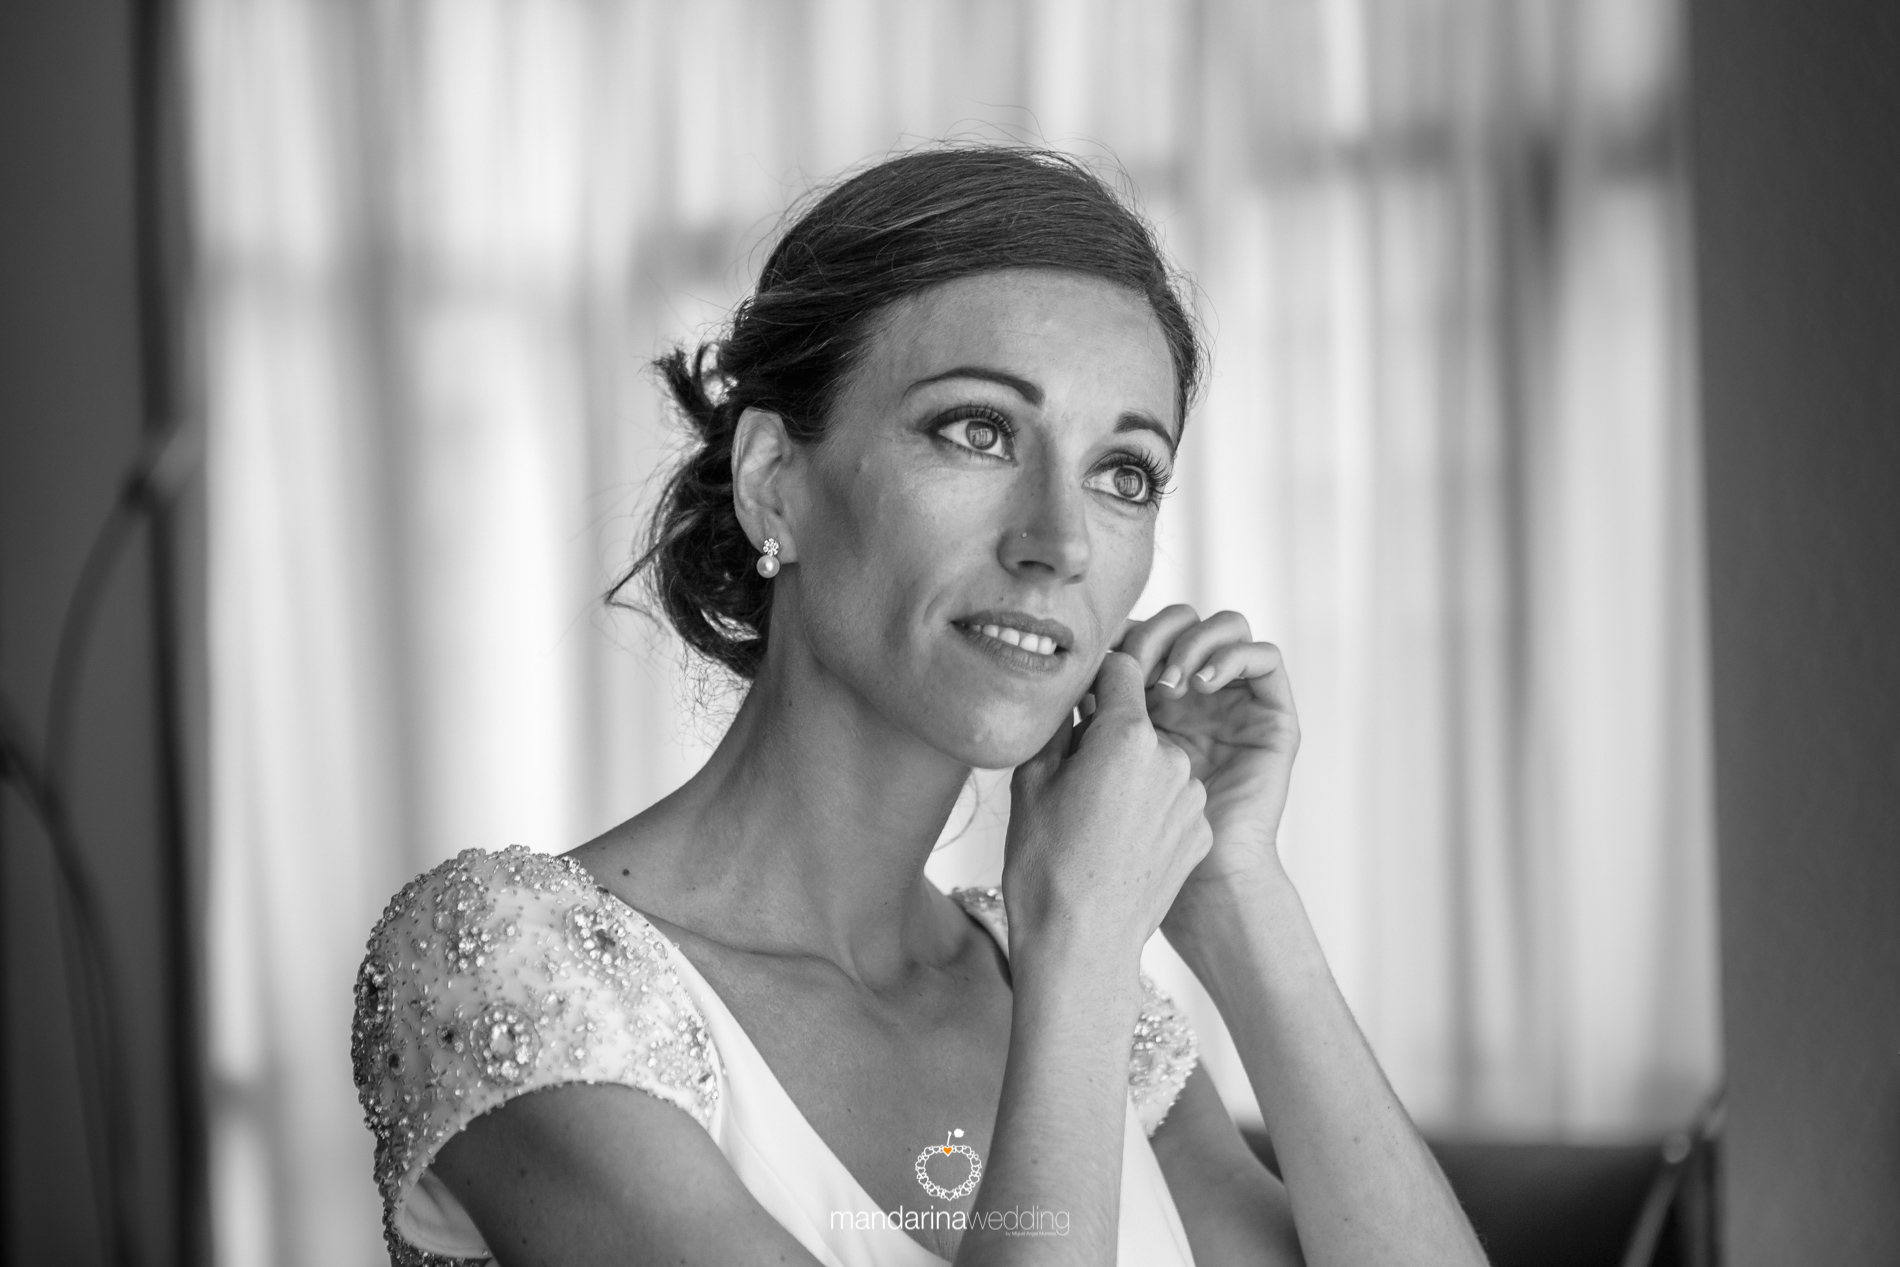 mandaria wedding, fotografos de boda, fotoperiodismo de boda, mejores fotografos de boda, bodas soria, bodas pirineo, bodas Madrid, fotógrafos tarragona_03